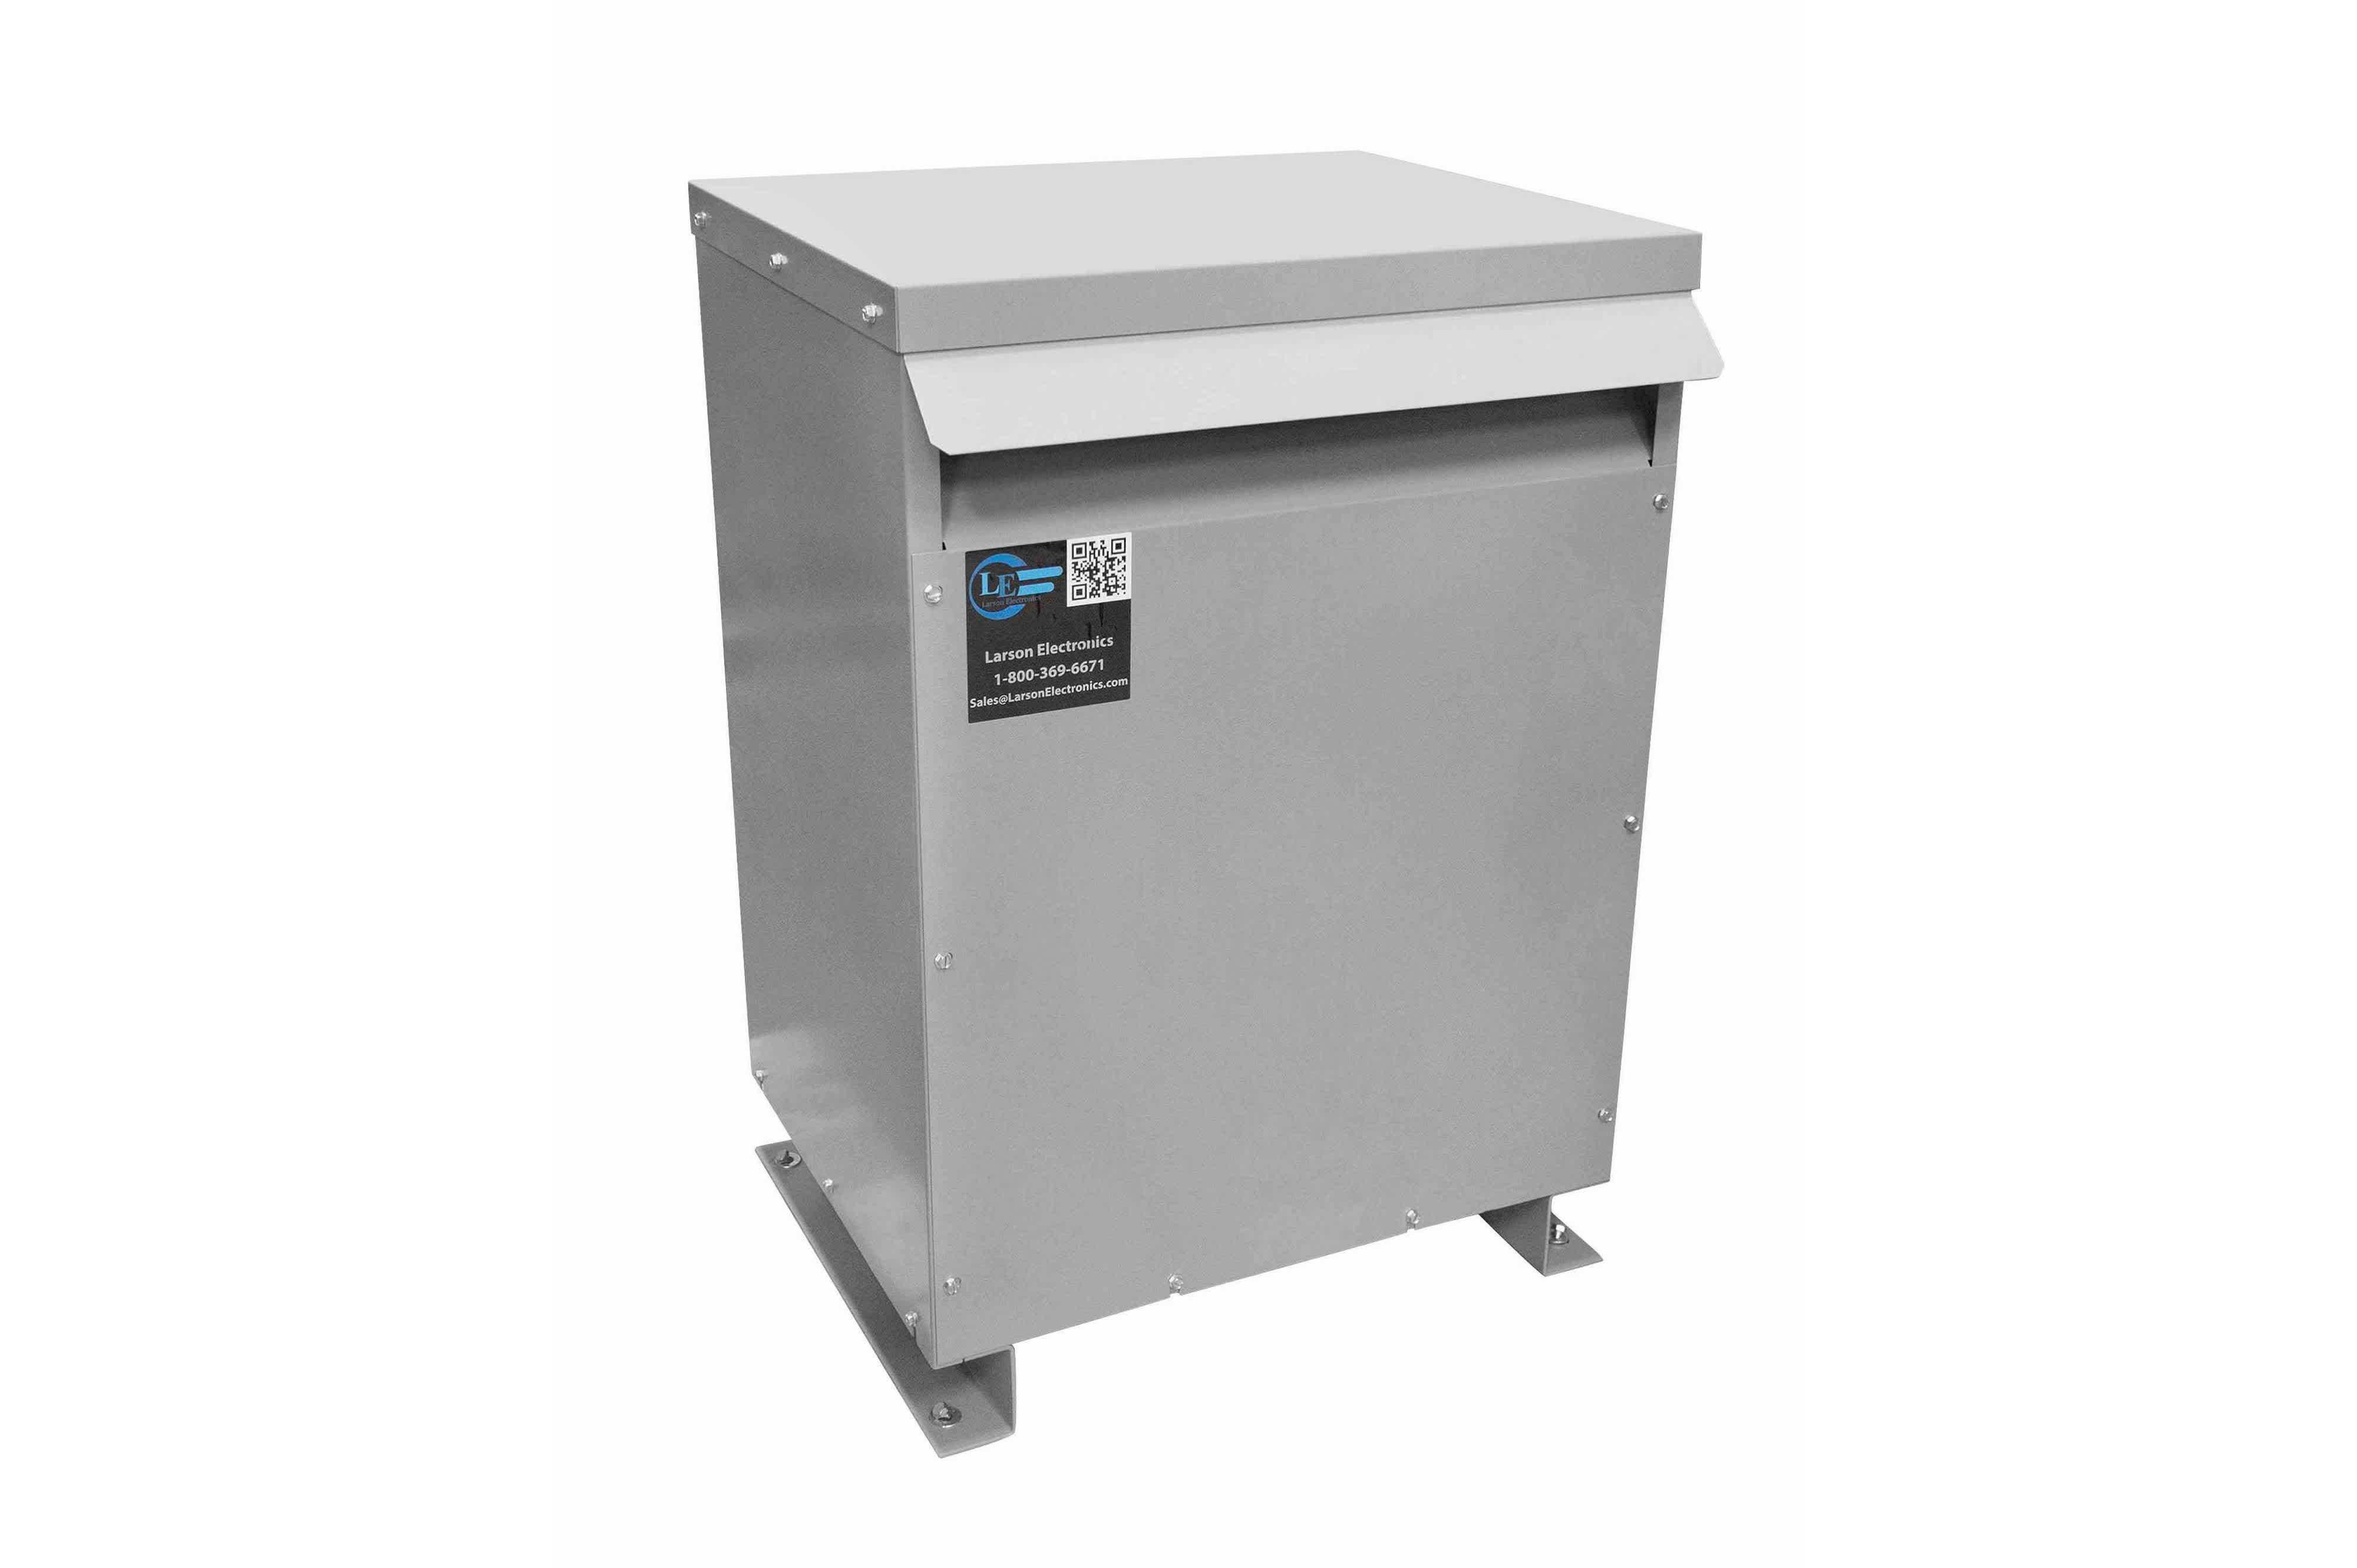 30 kVA 3PH Isolation Transformer, 600V Wye Primary, 208V Delta Secondary, N3R, Ventilated, 60 Hz